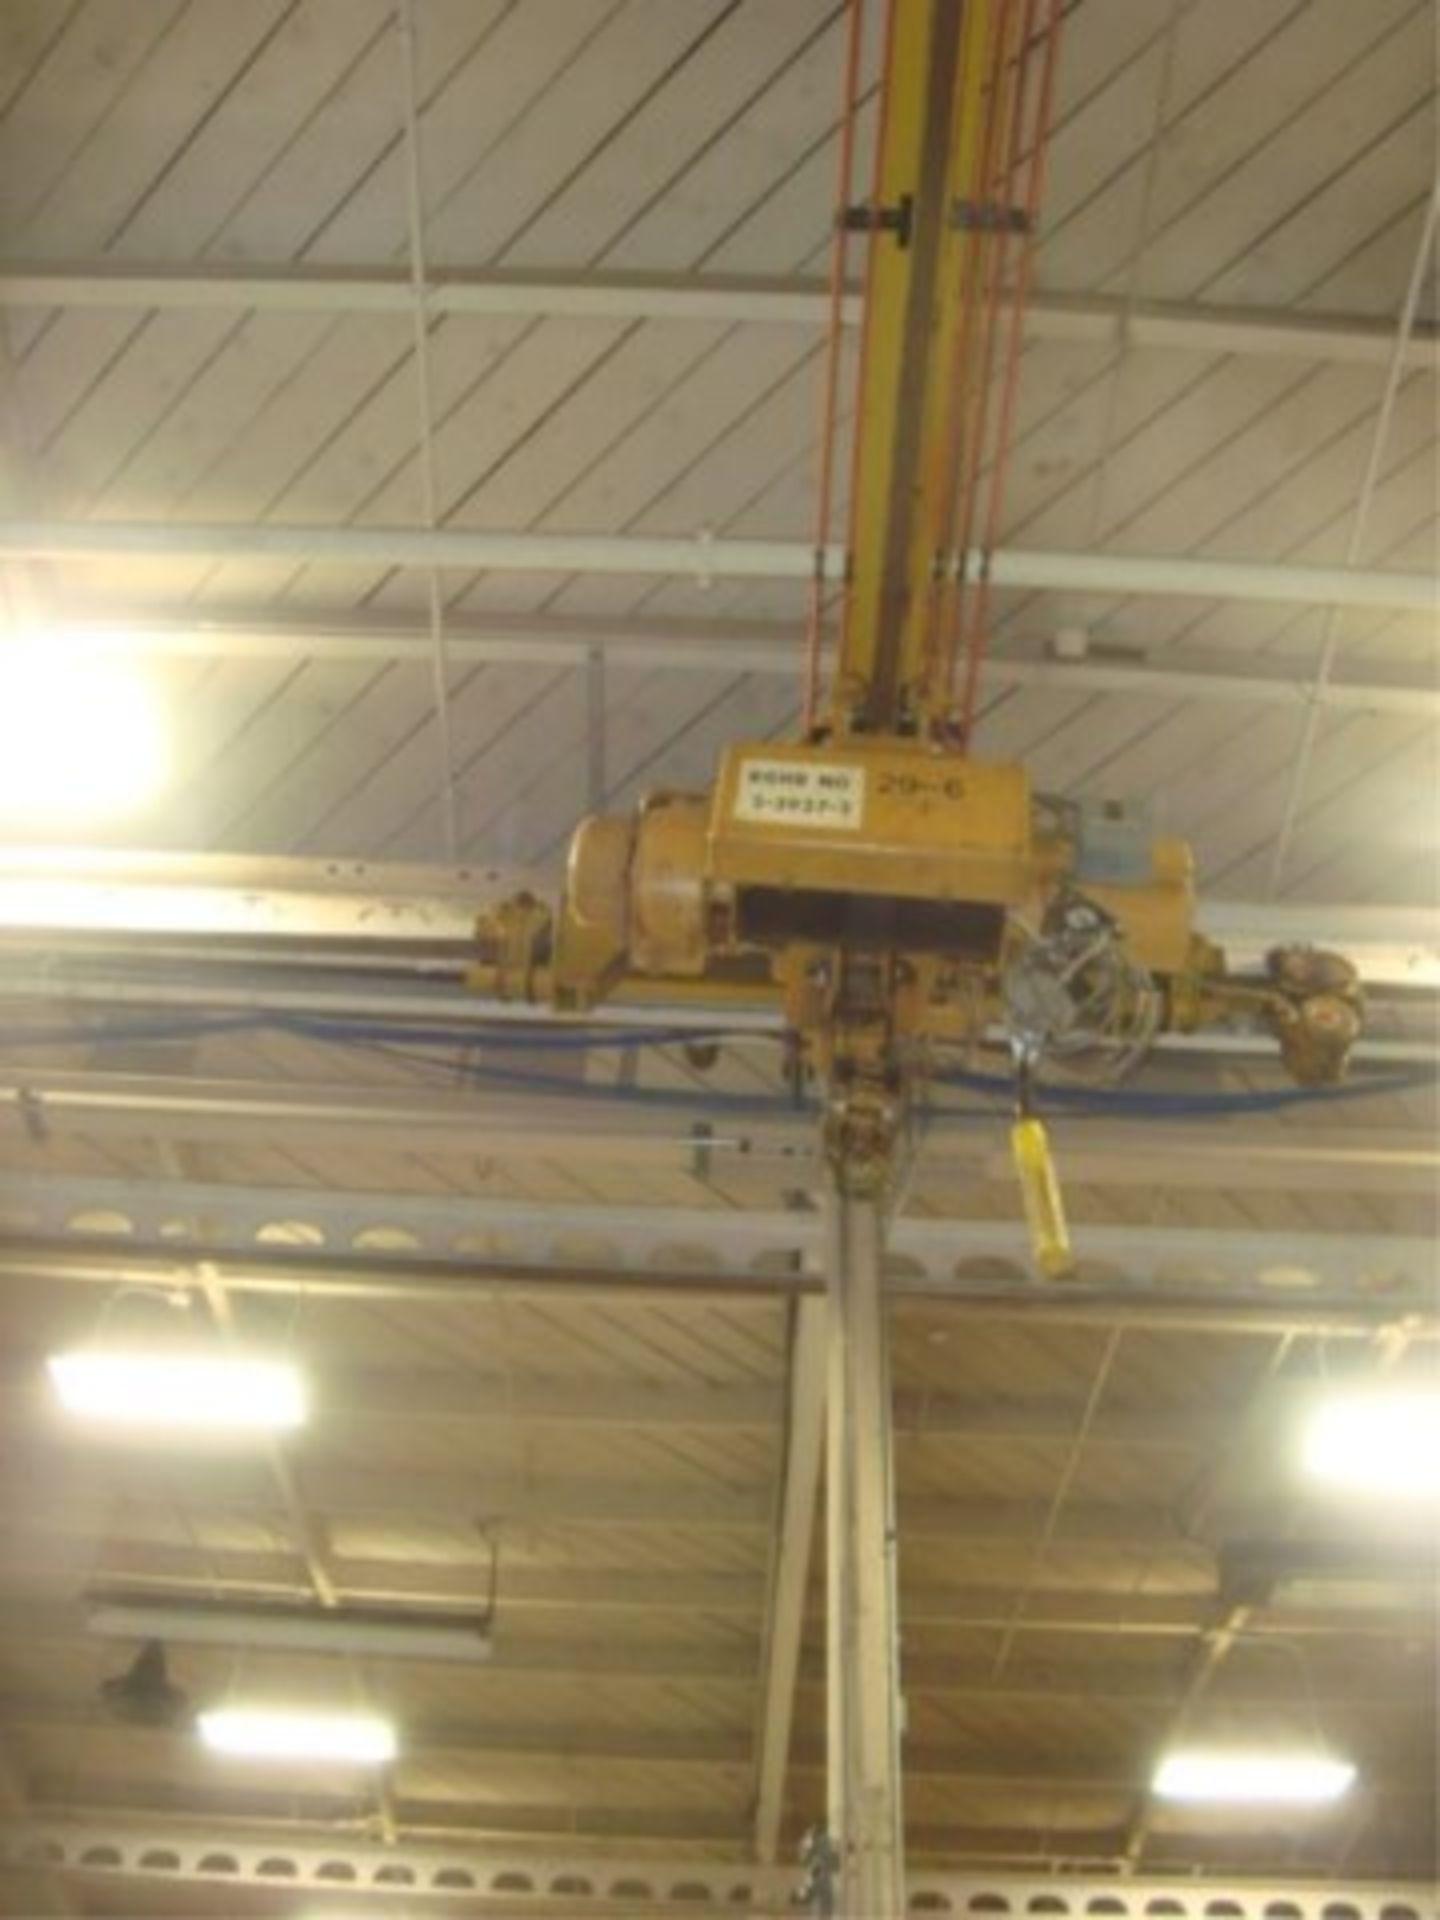 Lot 111 - 5-Ton Capacity Overhead Bridge Crane